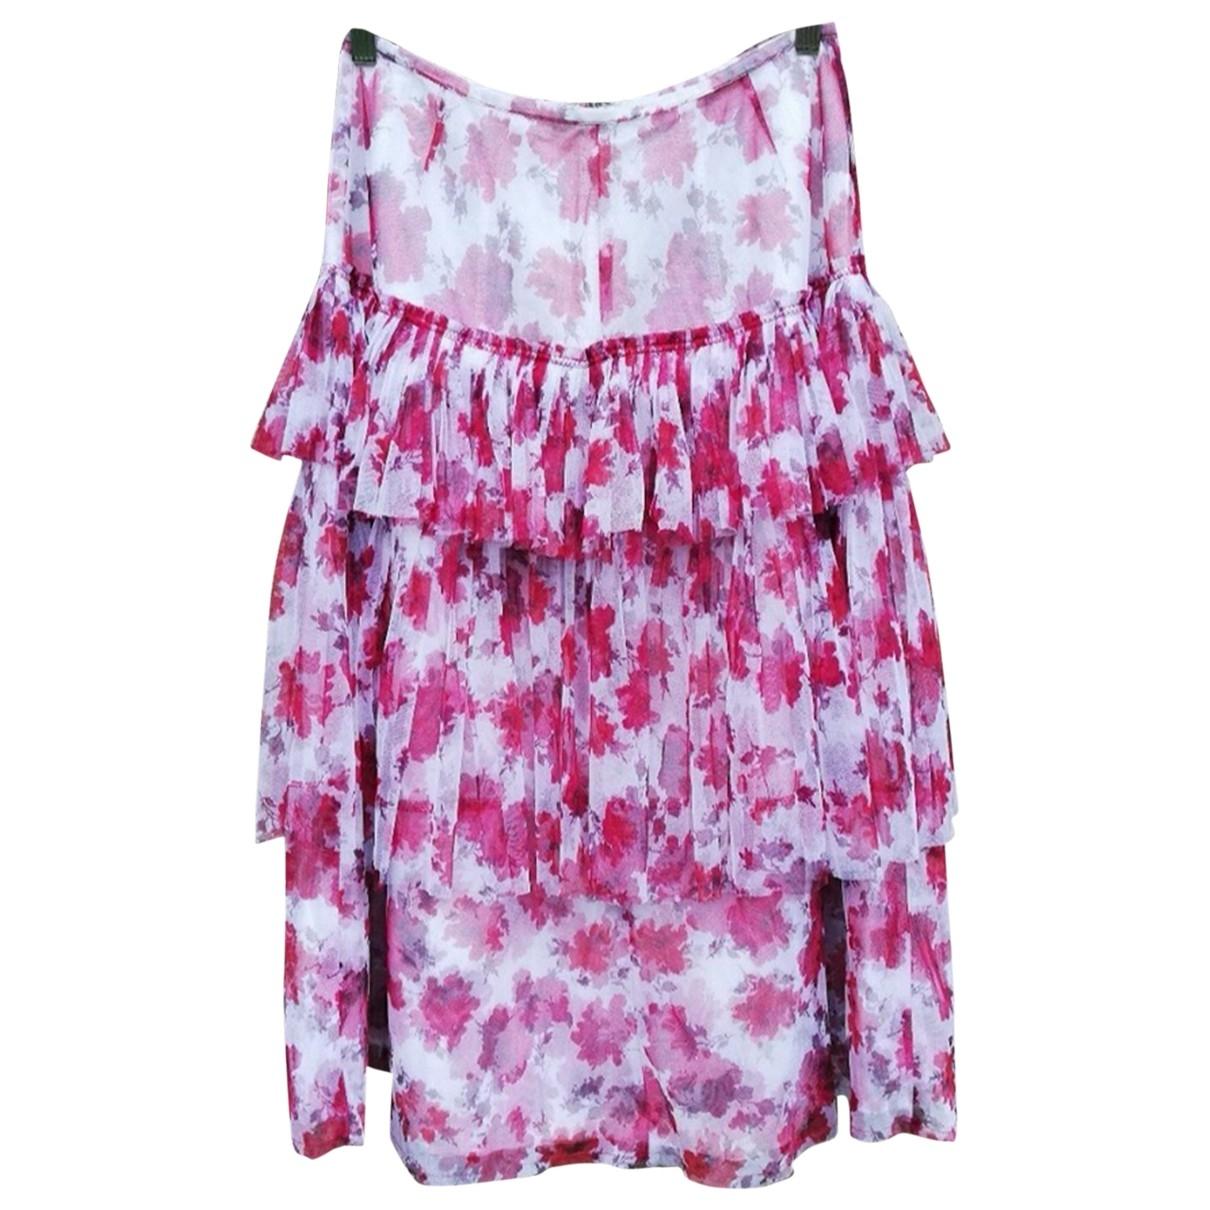 Dries Van Noten \N Pink Cotton skirt for Women 38 FR